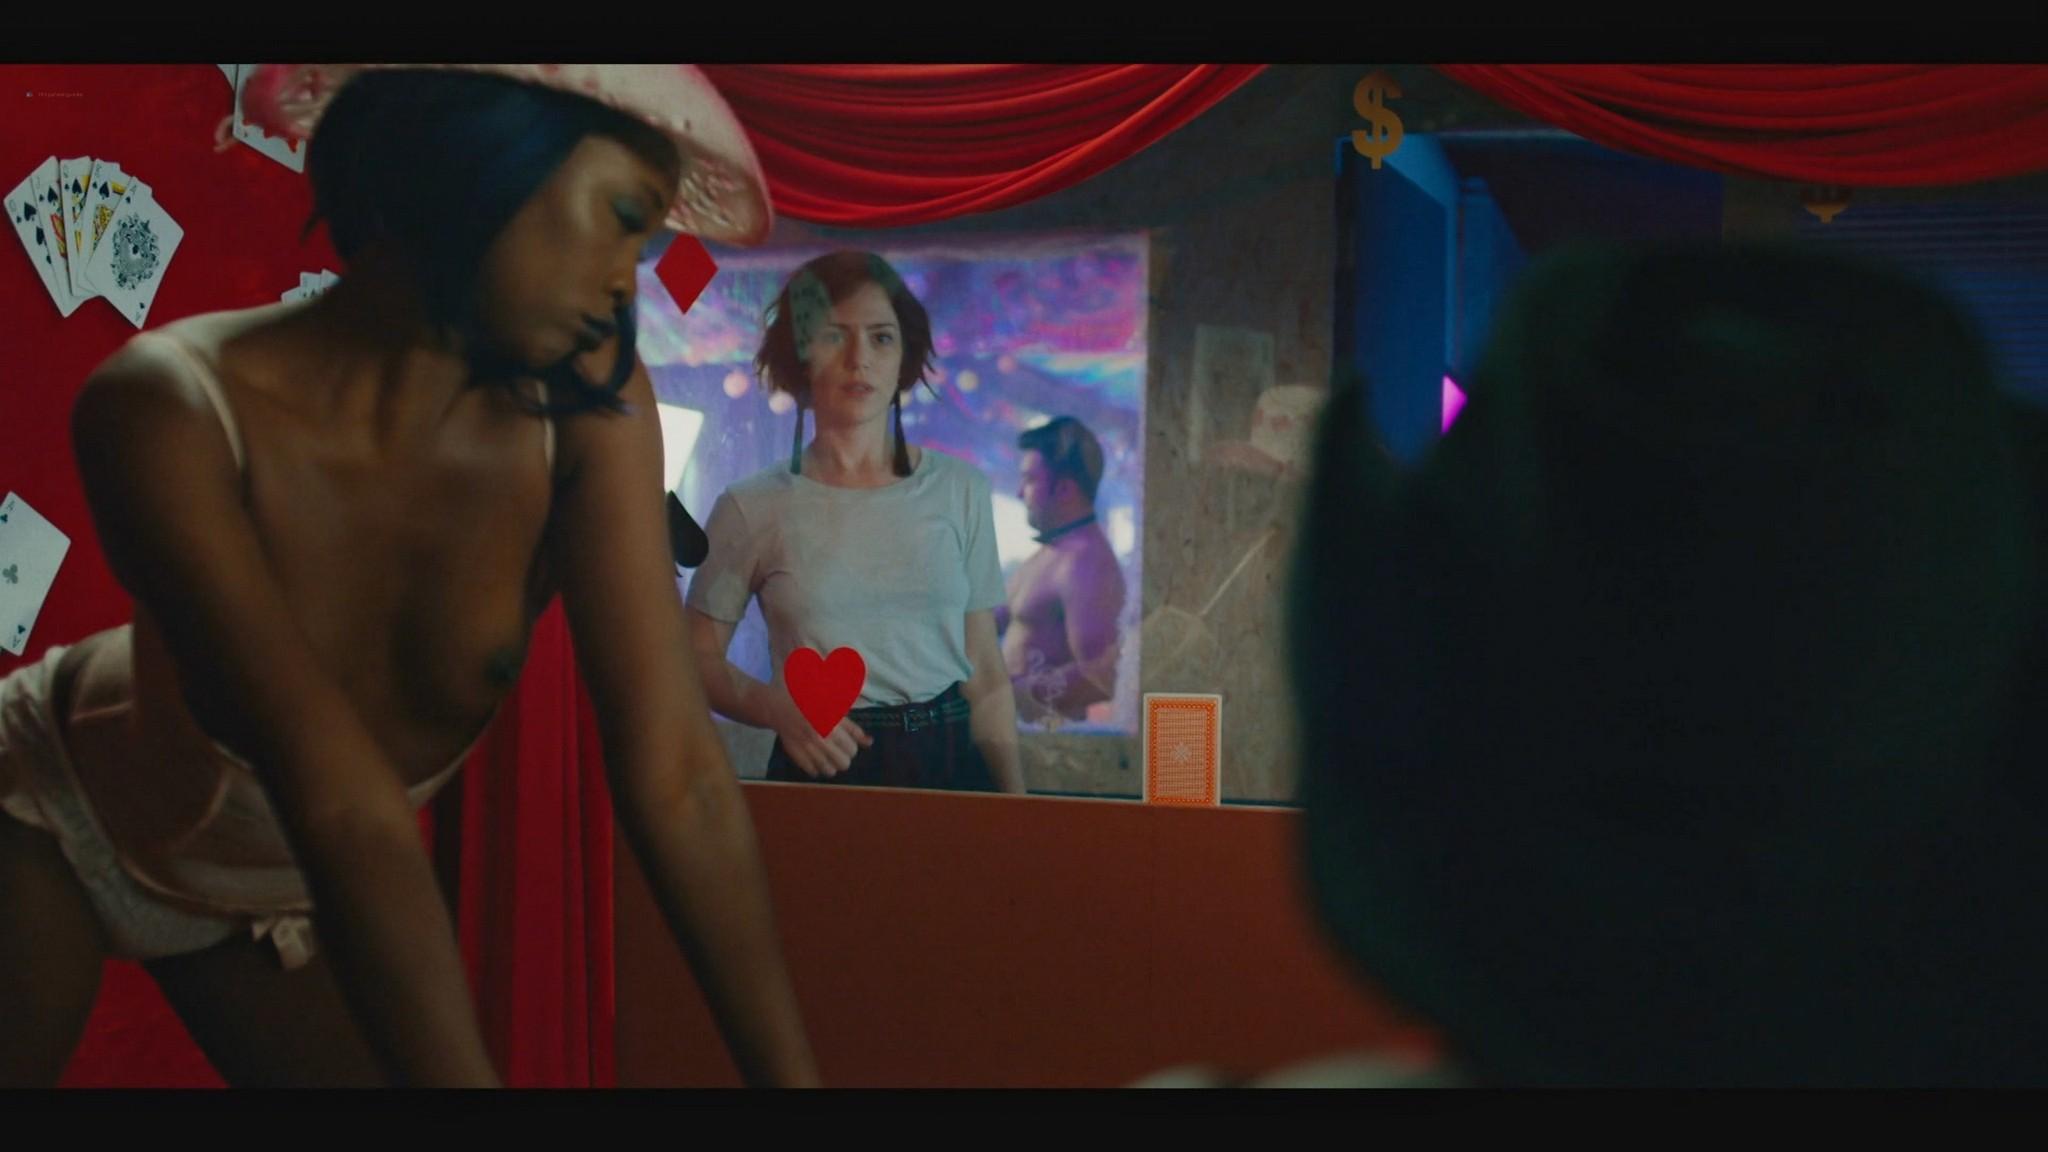 Brunna Martins nude Carolina Ferraz Natalia Lage and others nude orgy and sexy Hard 2021 s3e1 2 1080p Web 12